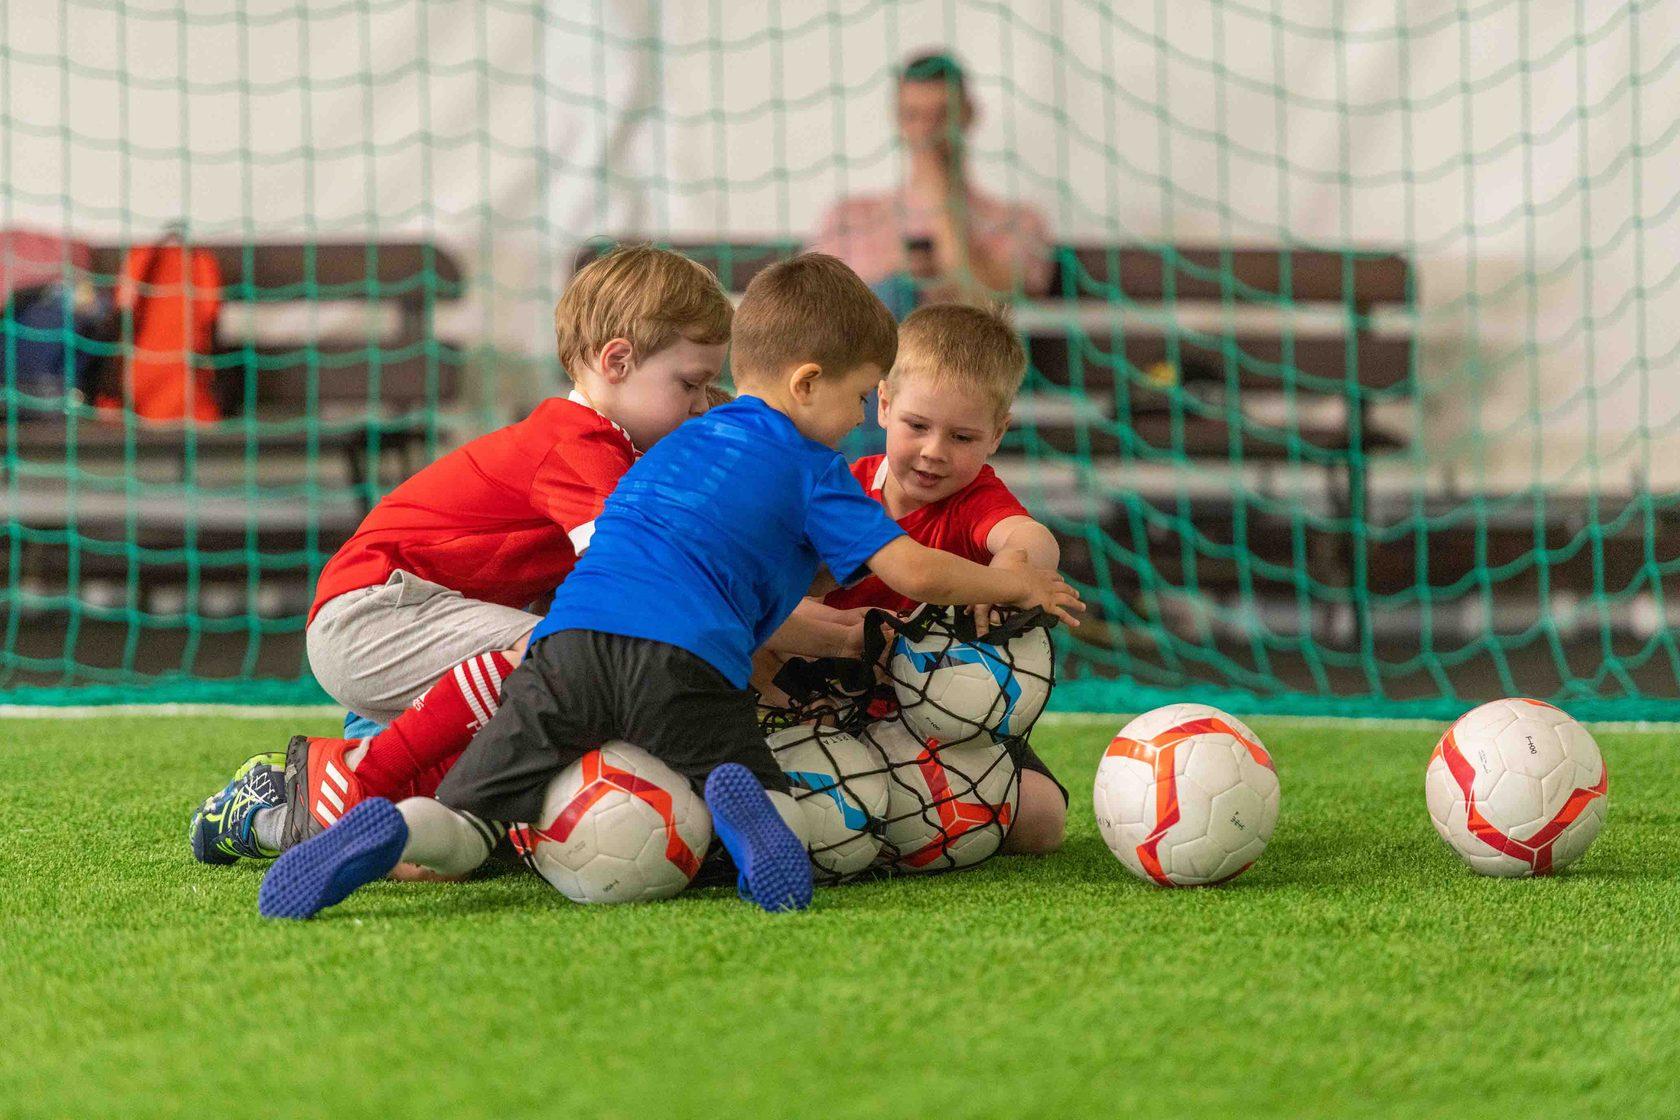 Картинки про футбол в школе